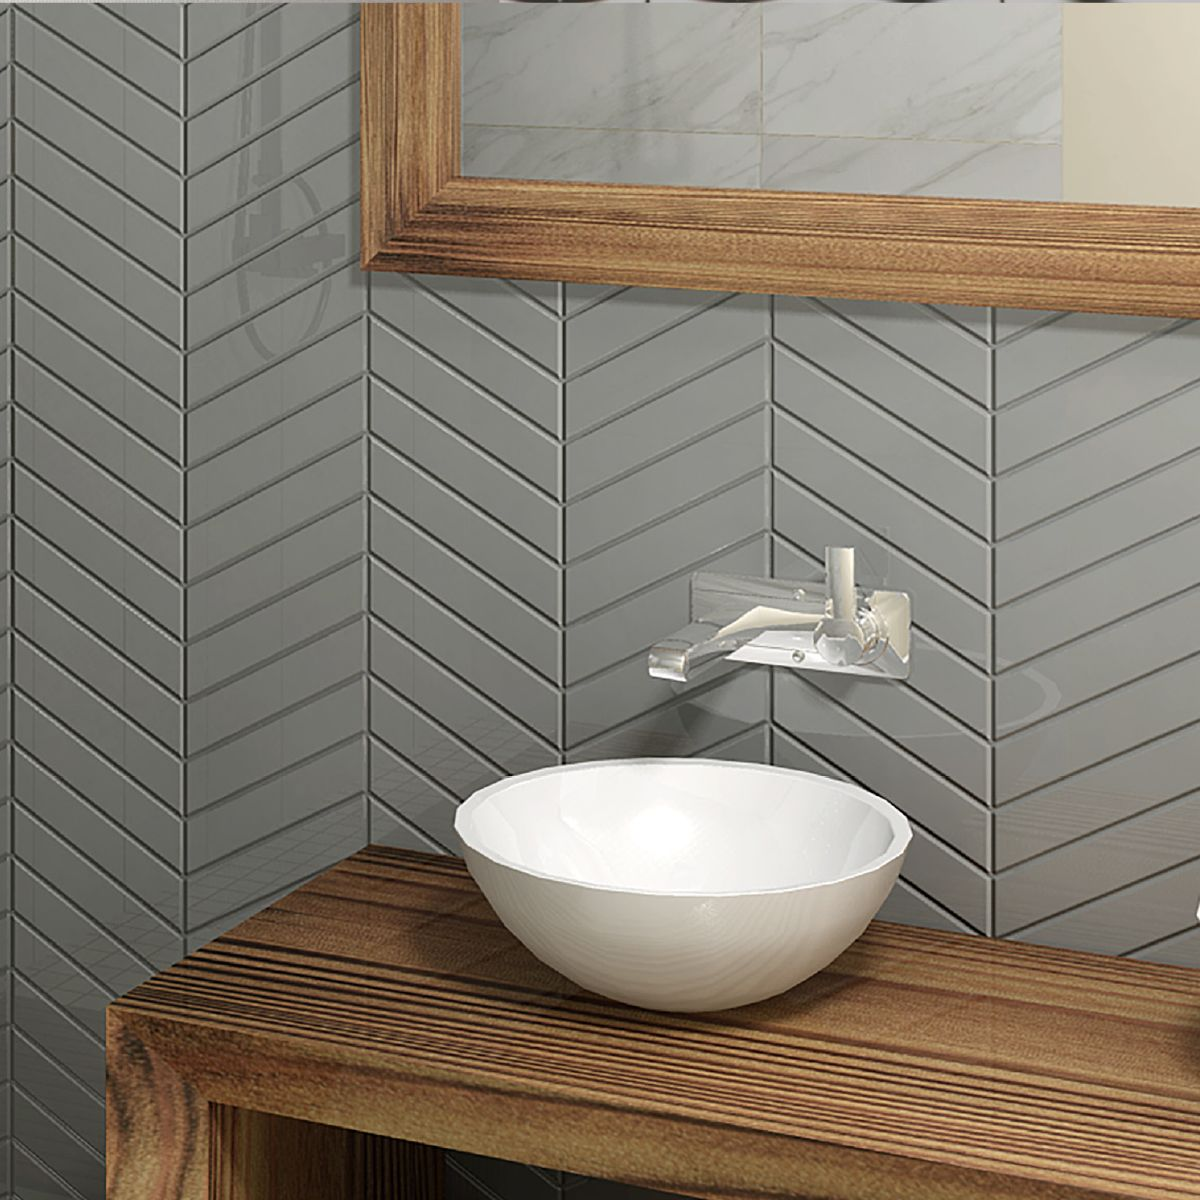 Peinture Salle De Bain Vert Olive ~ chevron tiles in soft shades of grey for those that loves modern